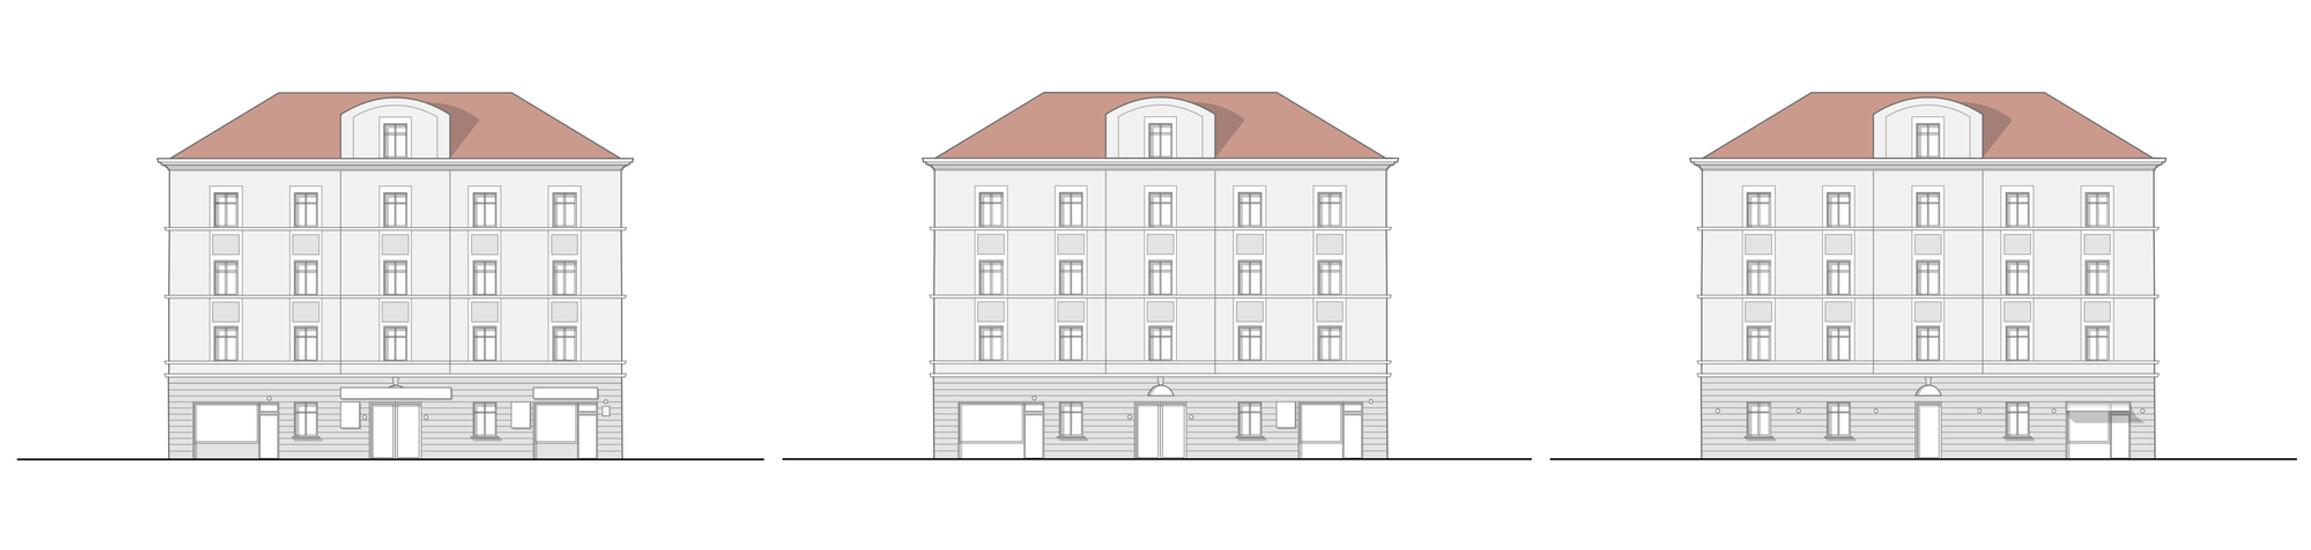 Fassadenstudie.jpg